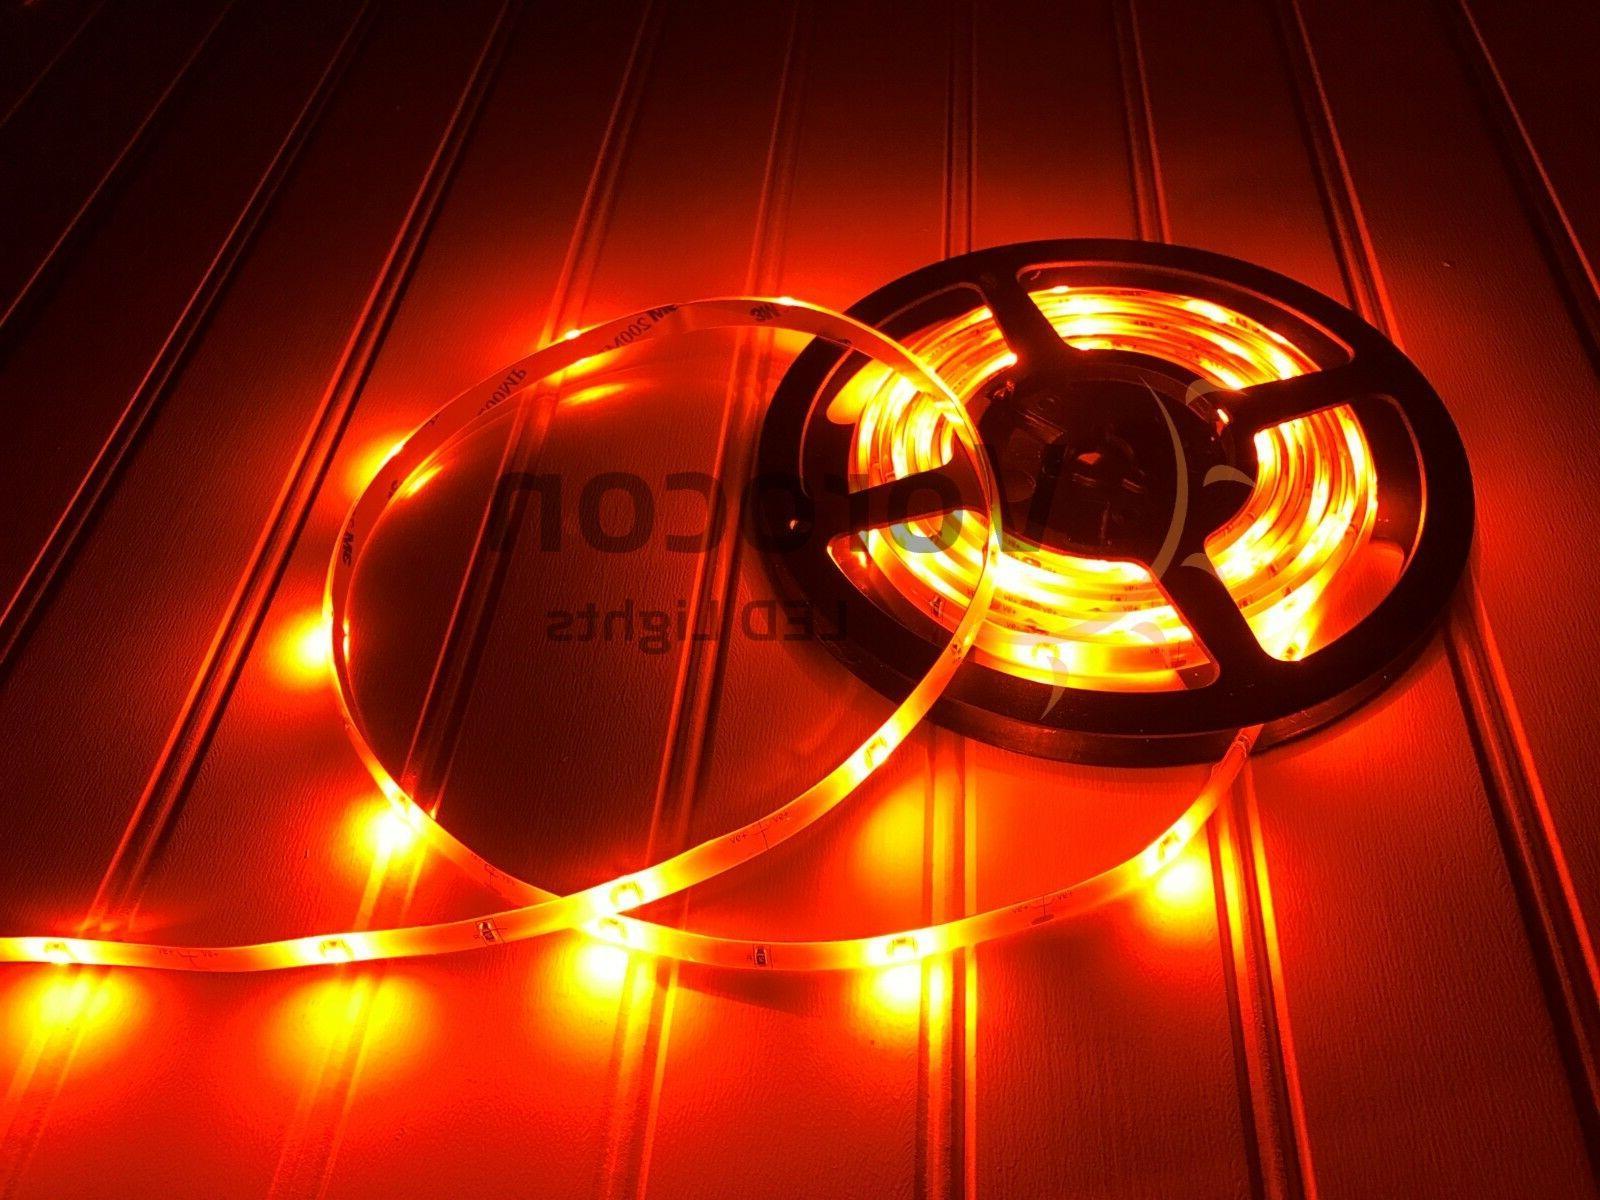 2pc LED Lights COLORS! Corn Hole Bag Toss